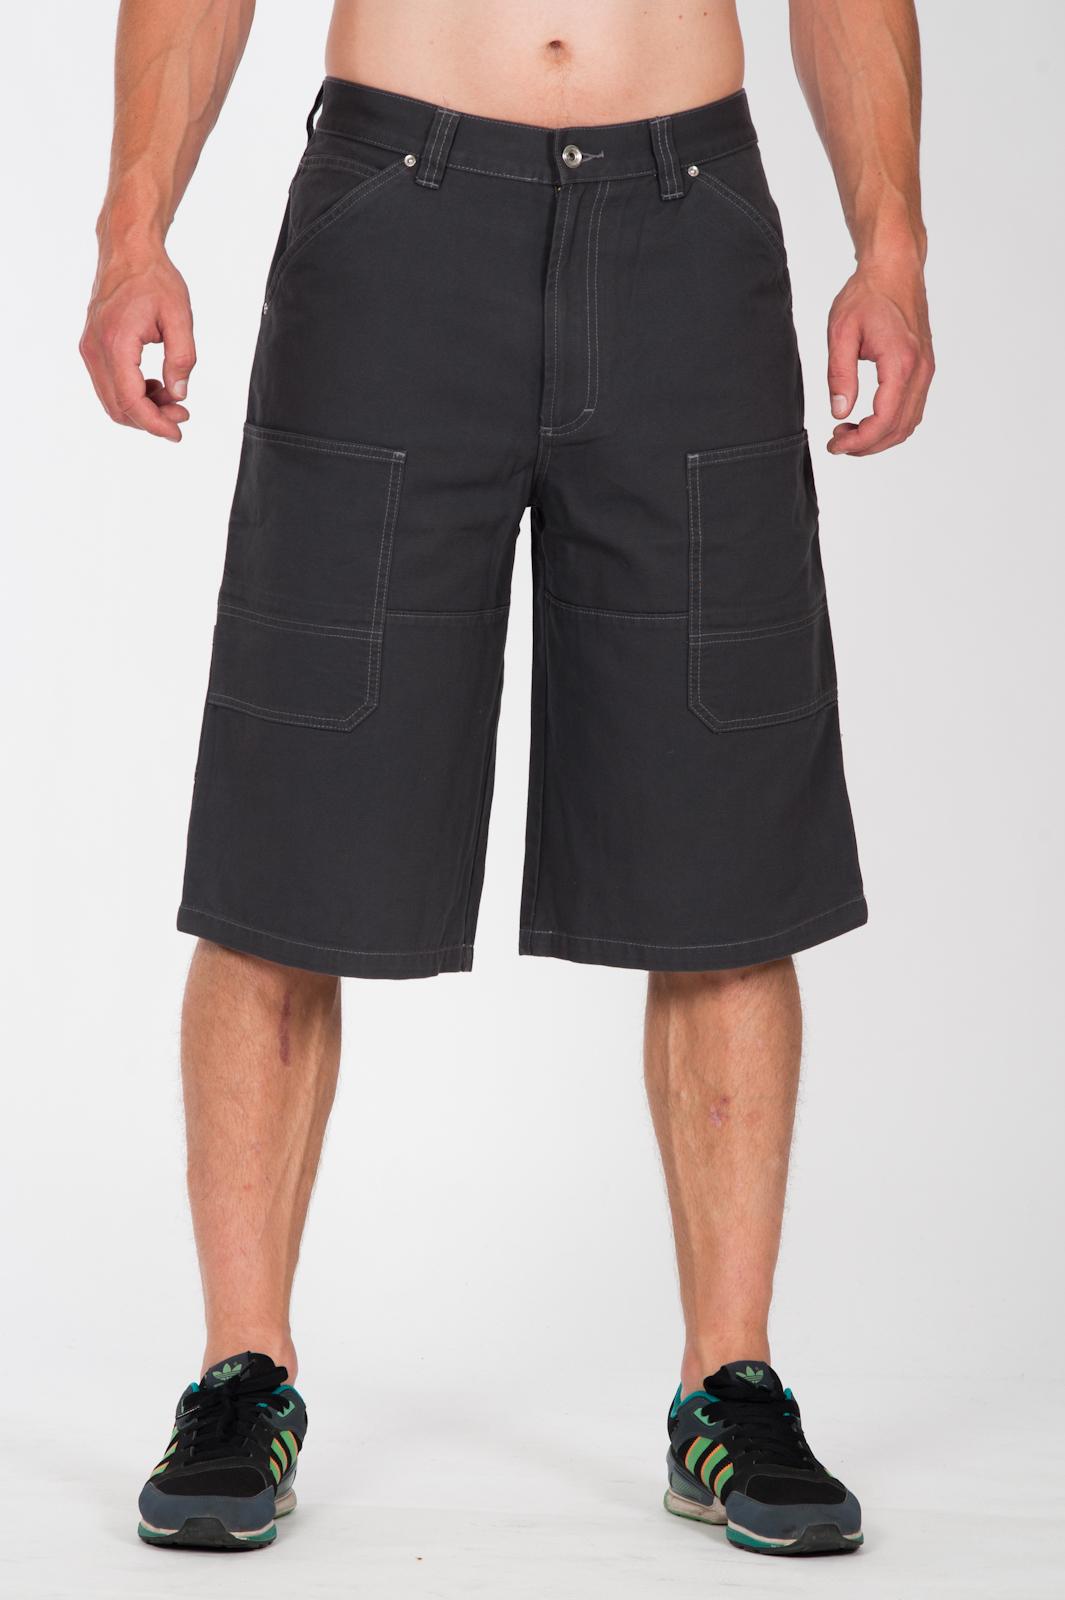 gas blue jeans kurze hose bermudas shorts herren men neu. Black Bedroom Furniture Sets. Home Design Ideas